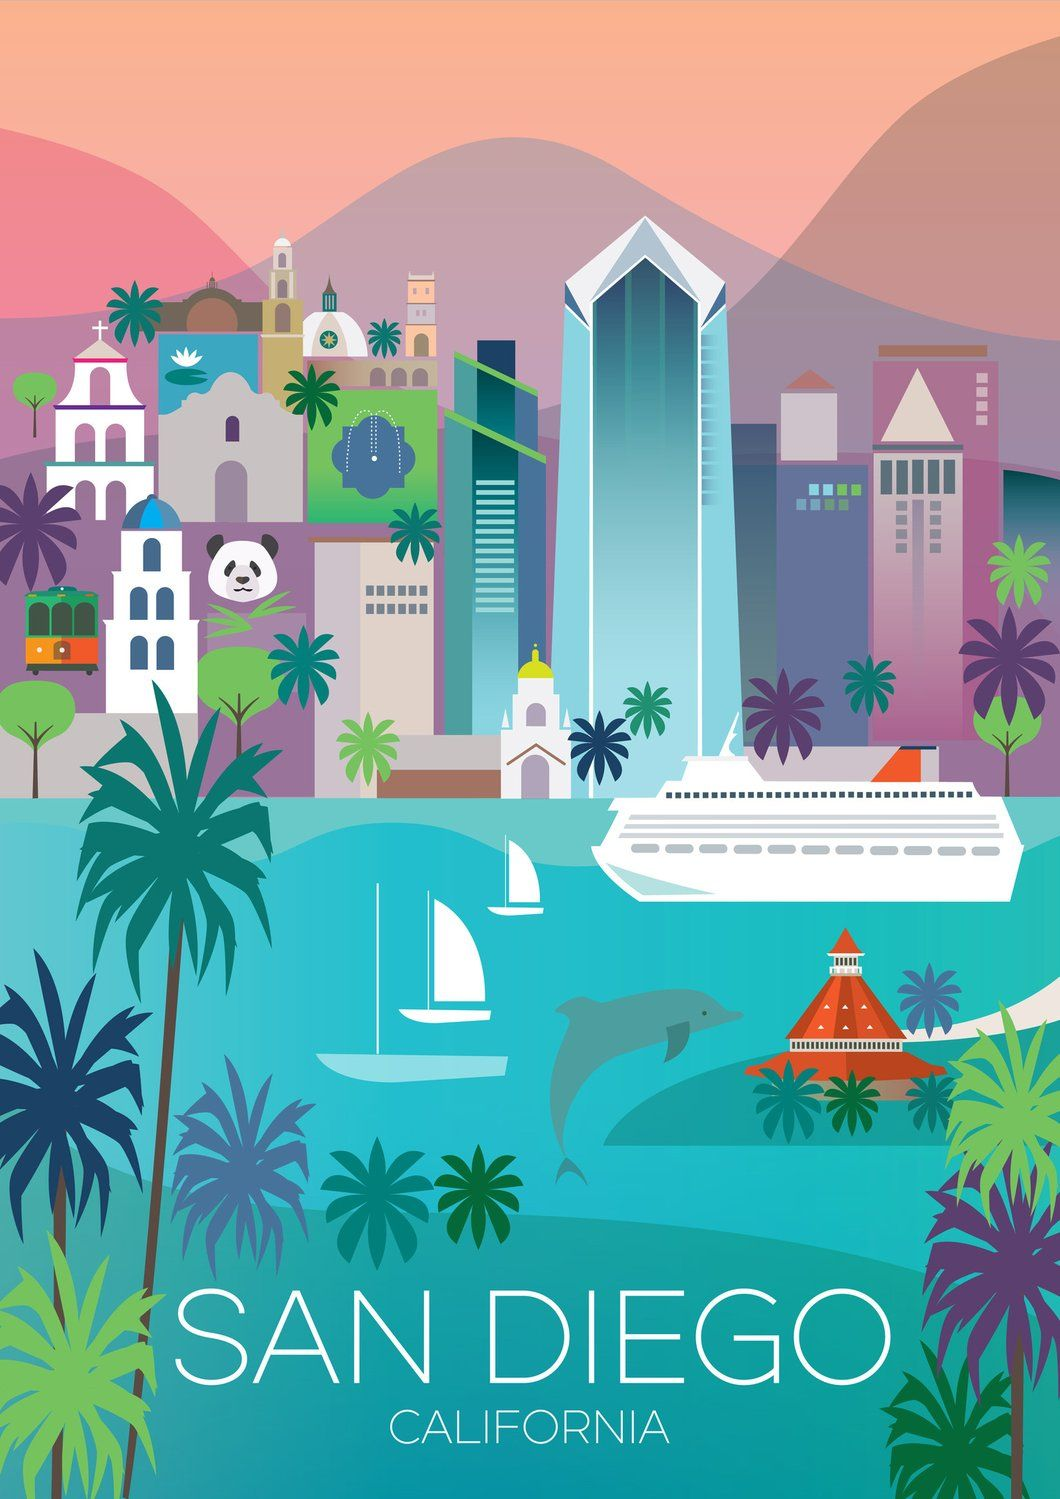 San Diego Design Series A Look Into Coronado Island: San Diego Print (With Images)